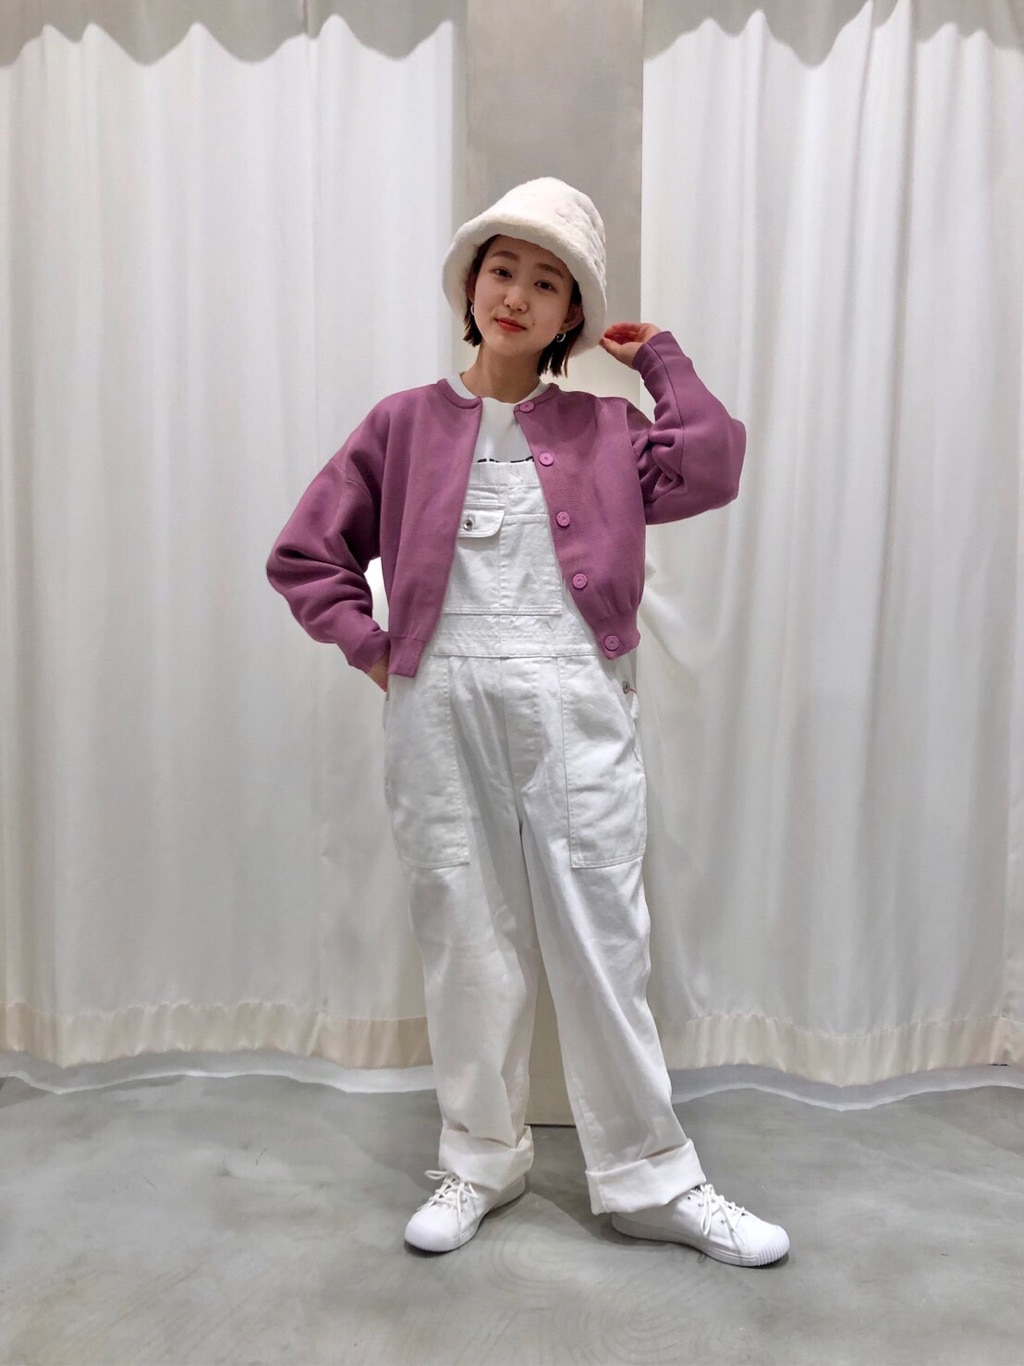 - CHILD WOMAN CHILD WOMAN , PAR ICI 東京スカイツリータウン・ソラマチ 身長:150cm 2020.10.02